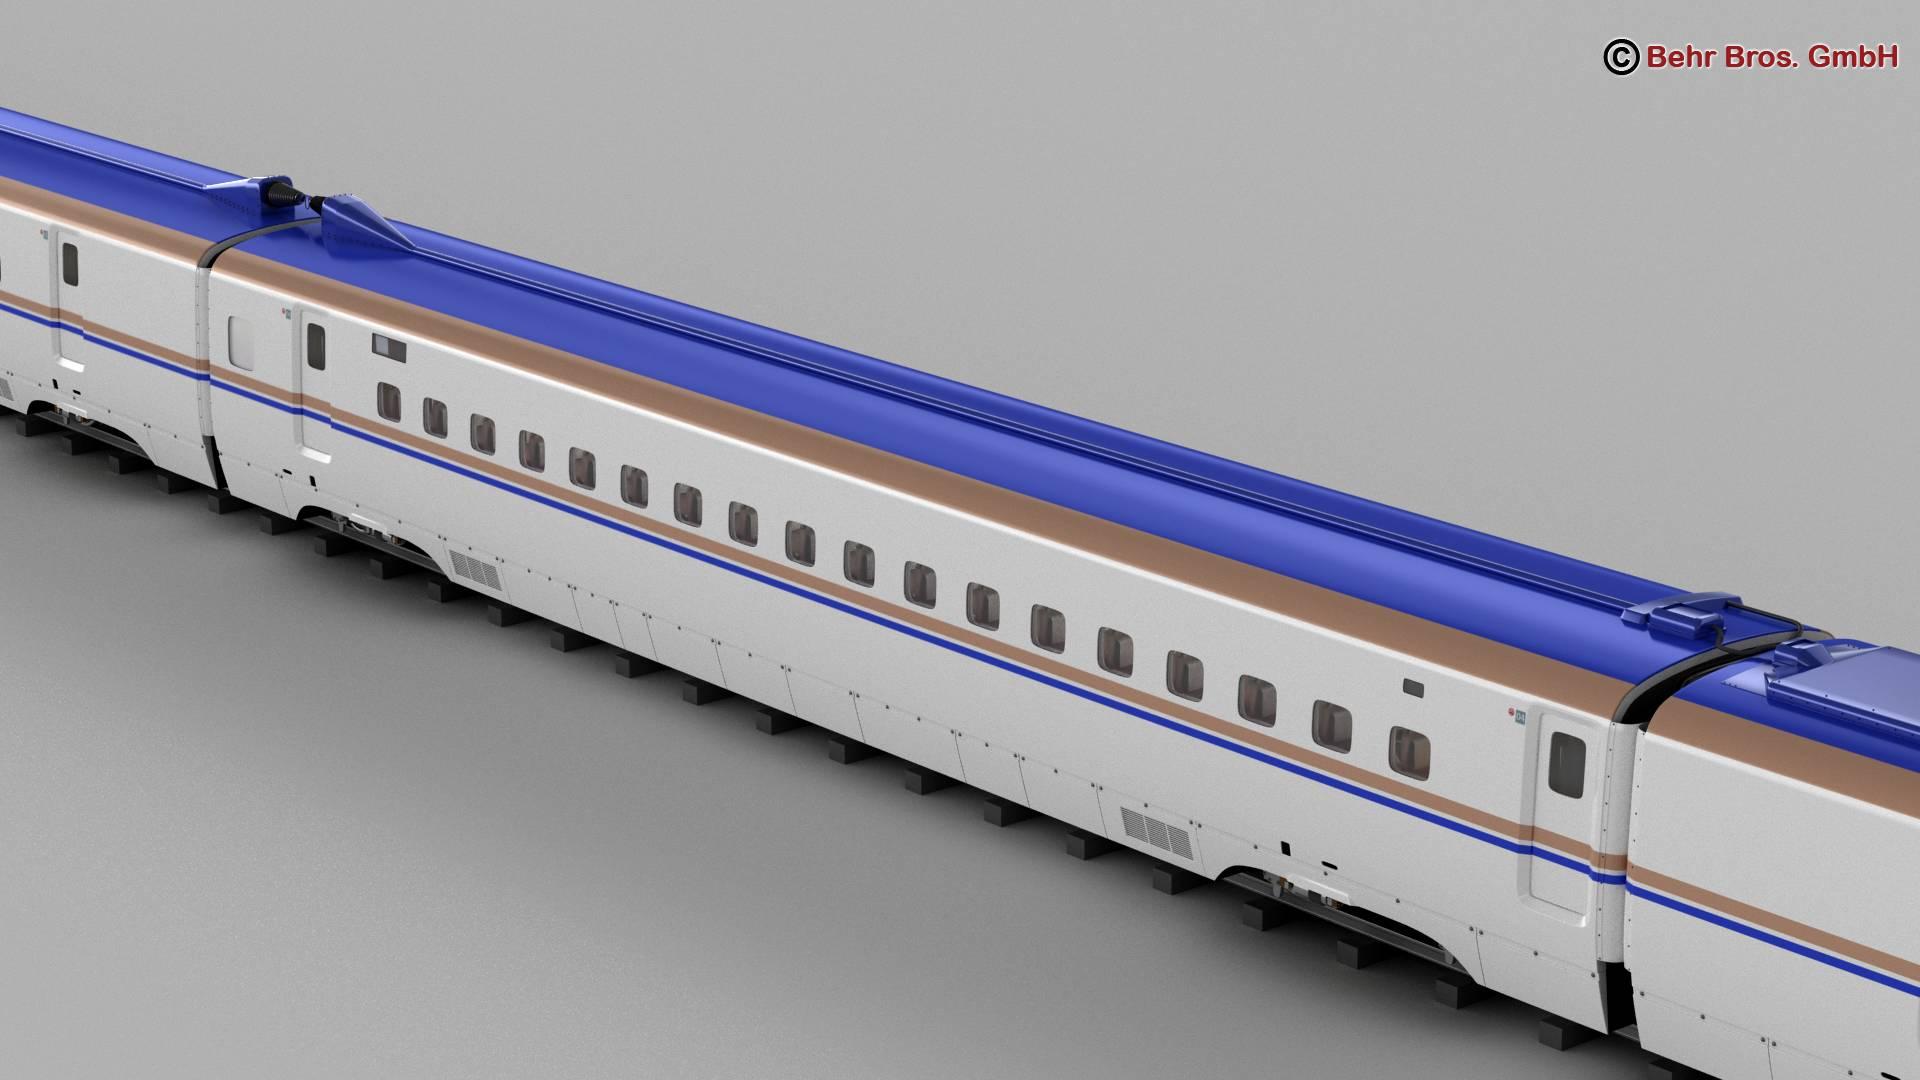 shinkansen e7 3d model 3ds max fbx c4d lwo ma mb obj 265654